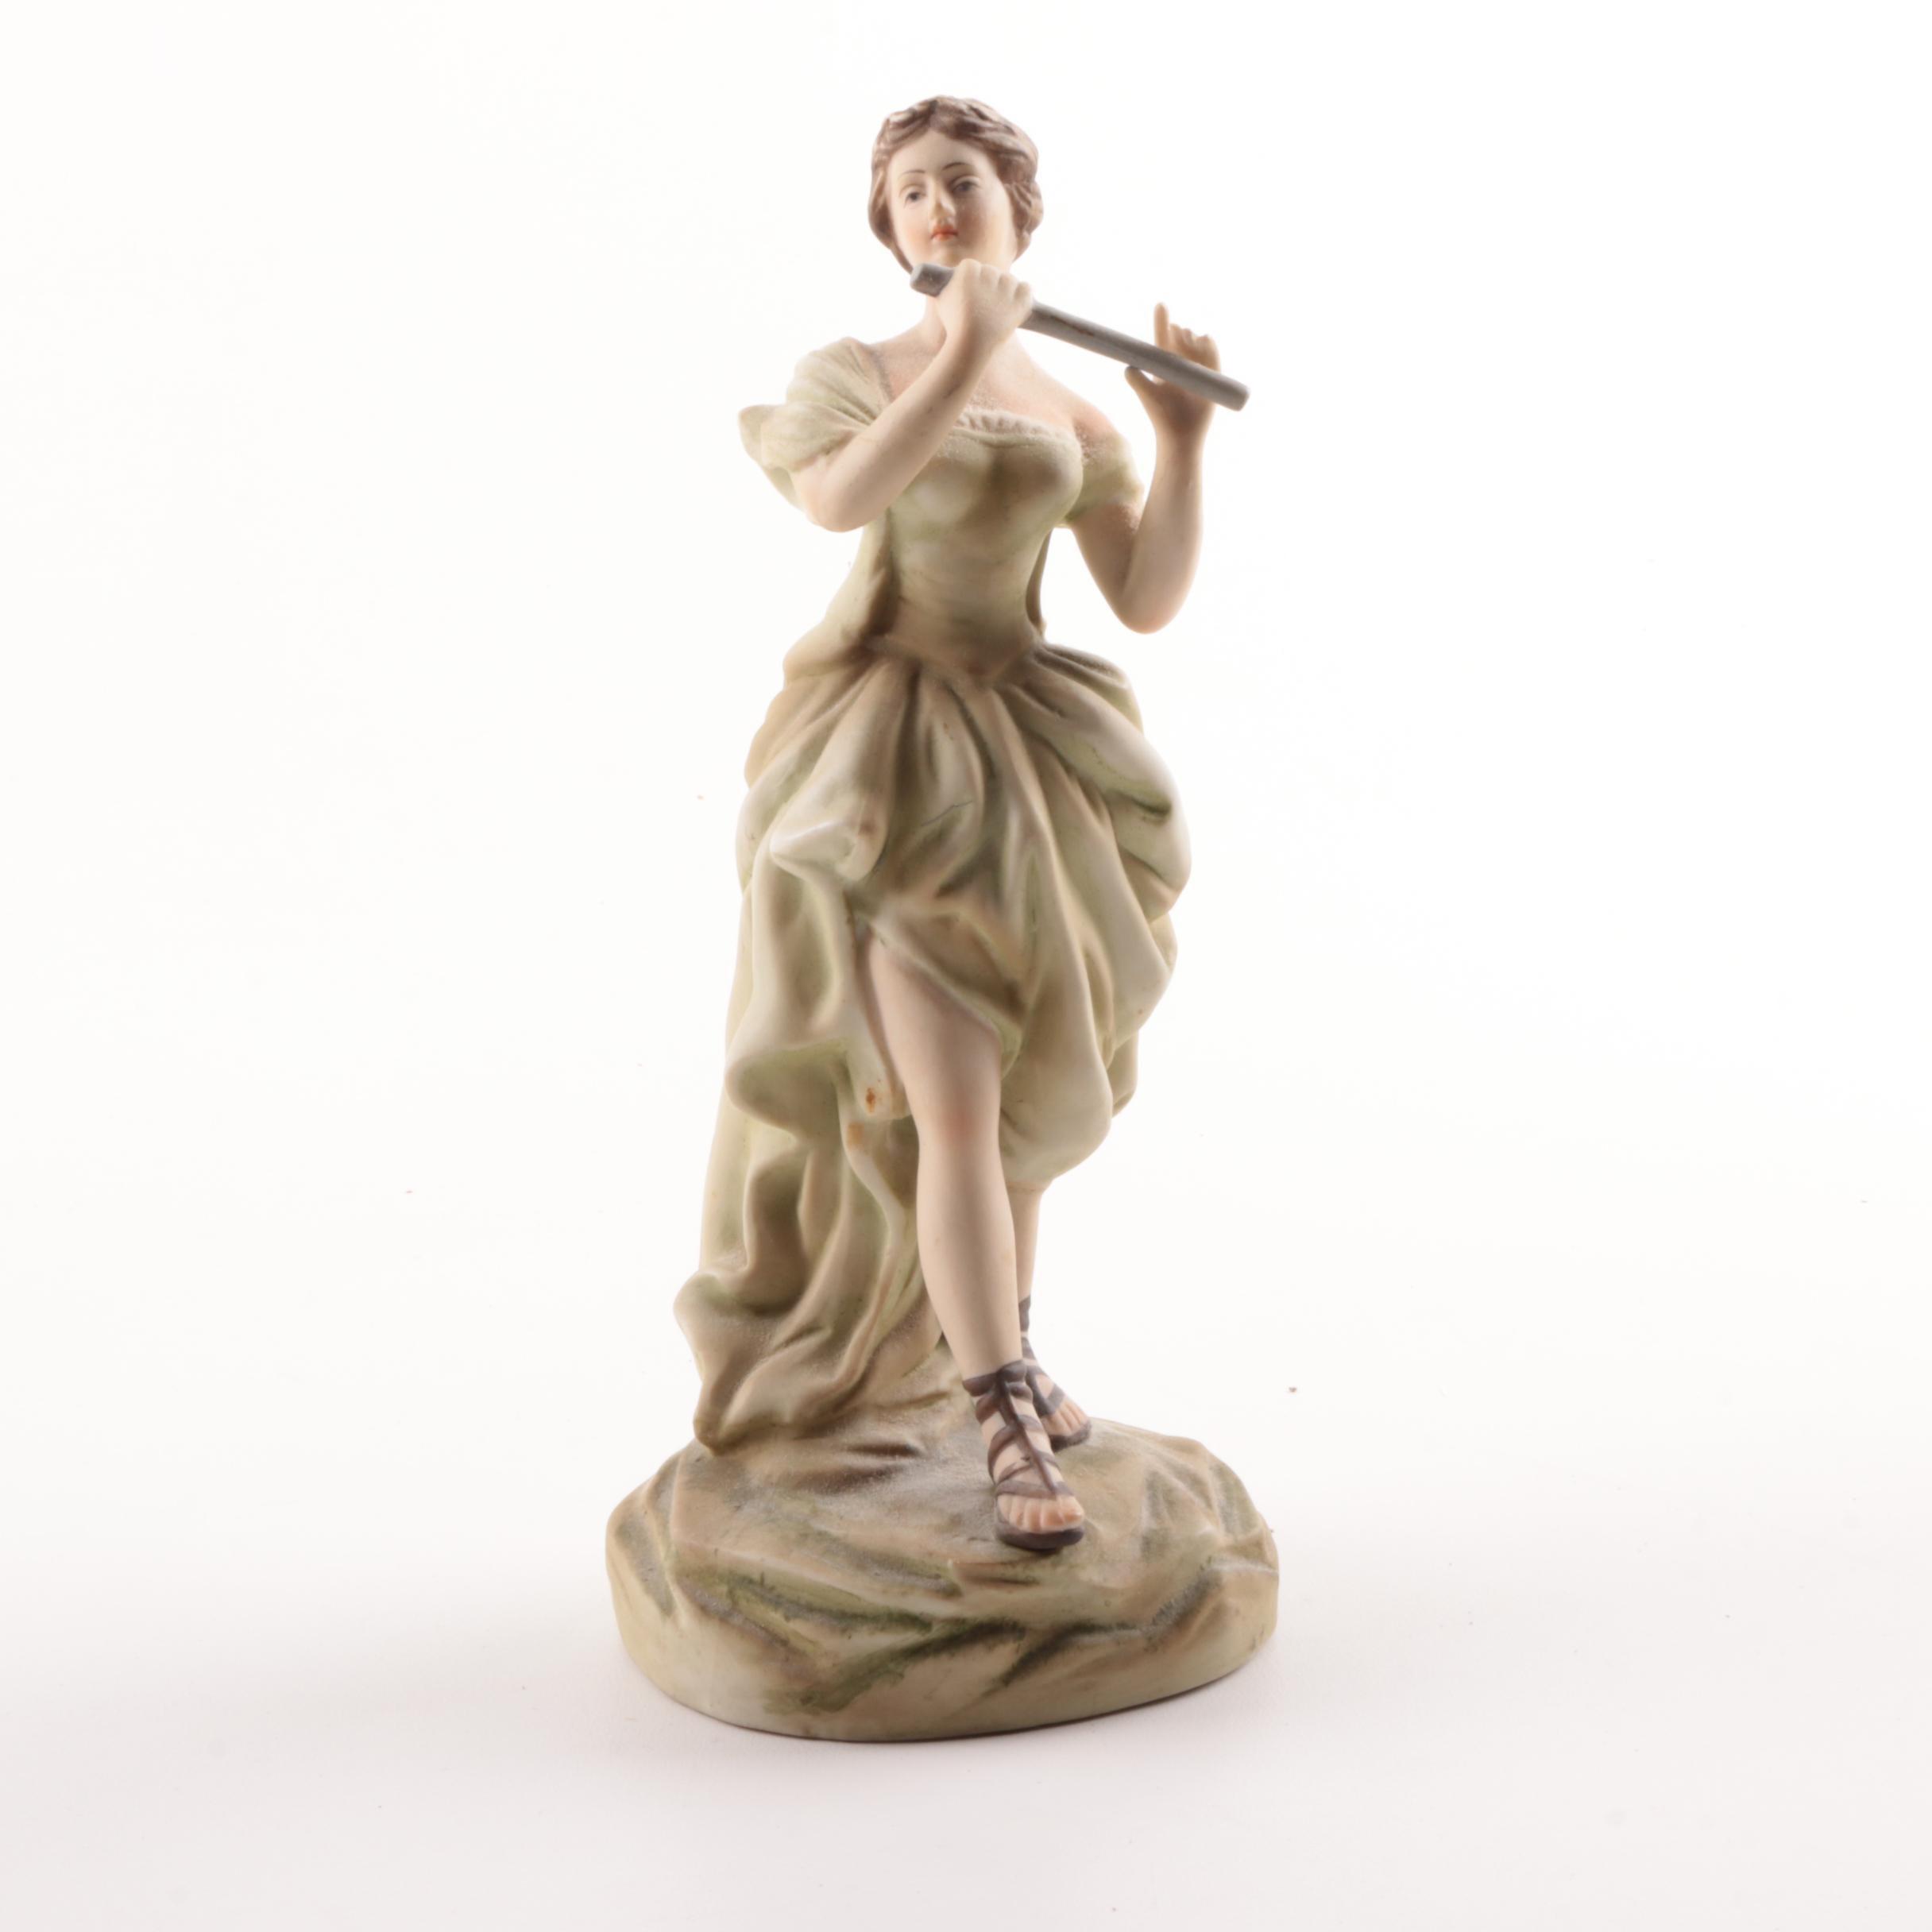 Porcelain Bisque Figurine